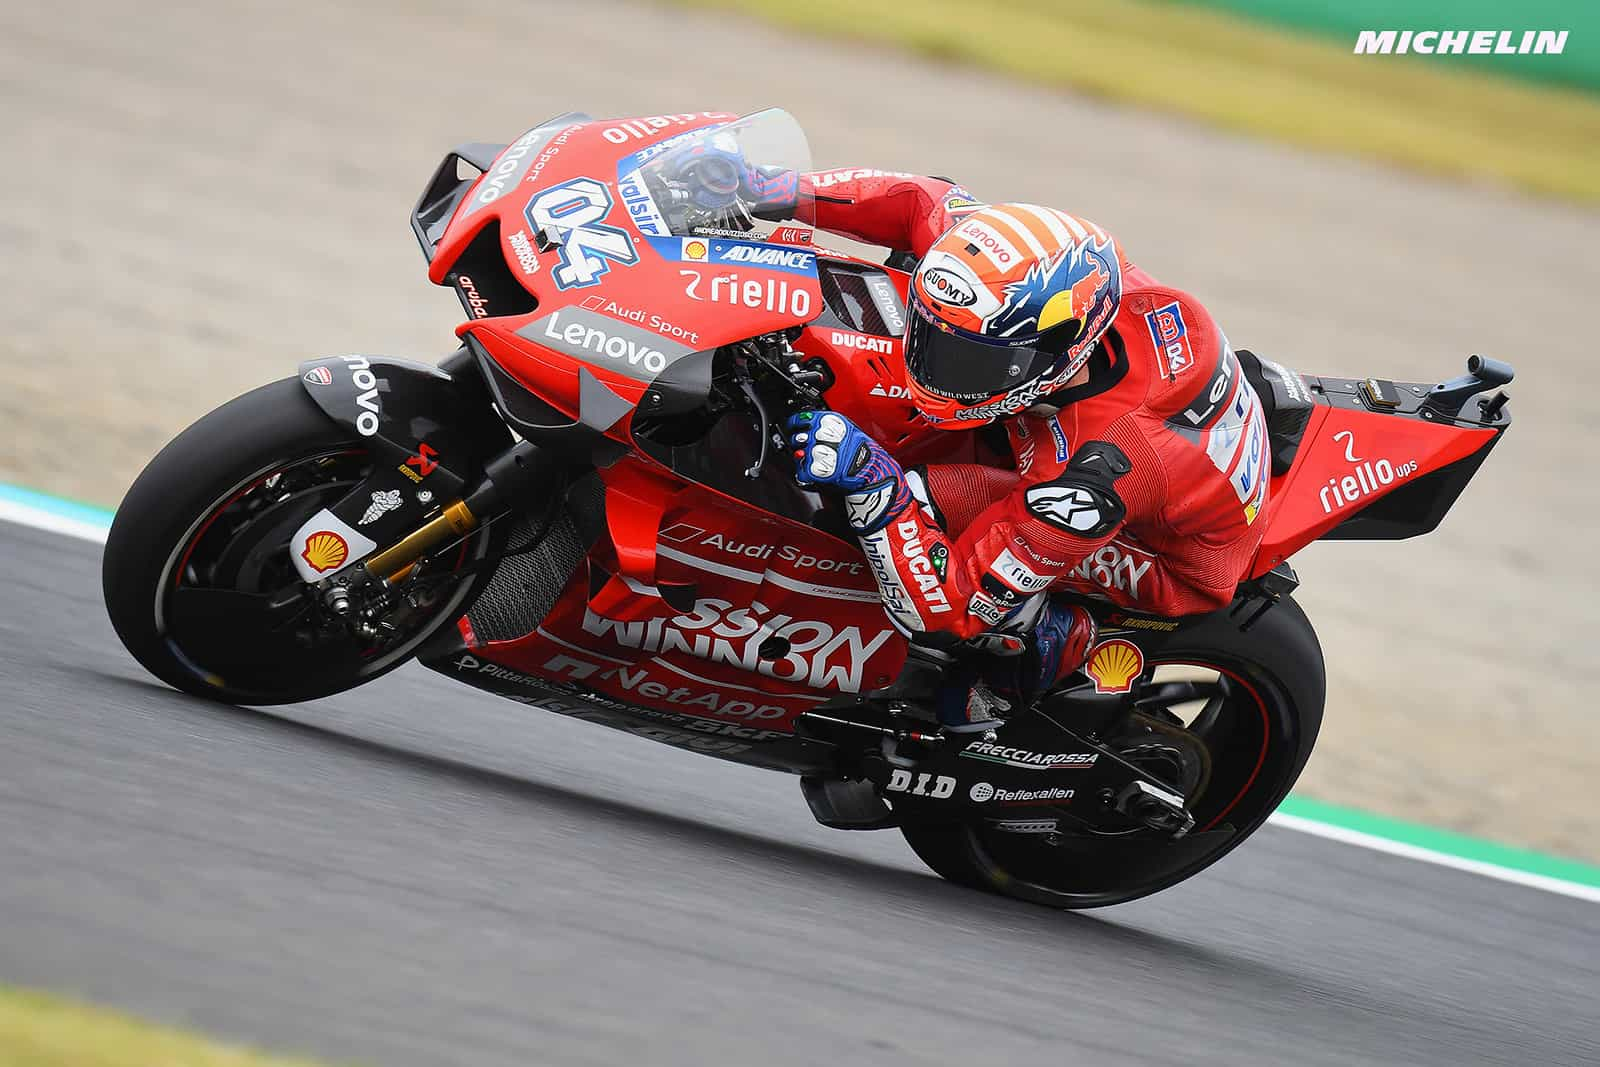 MotoGP2019オーストラリアGP ドヴィツィオーゾ「フィリップアイランドは相性が悪いトラック」